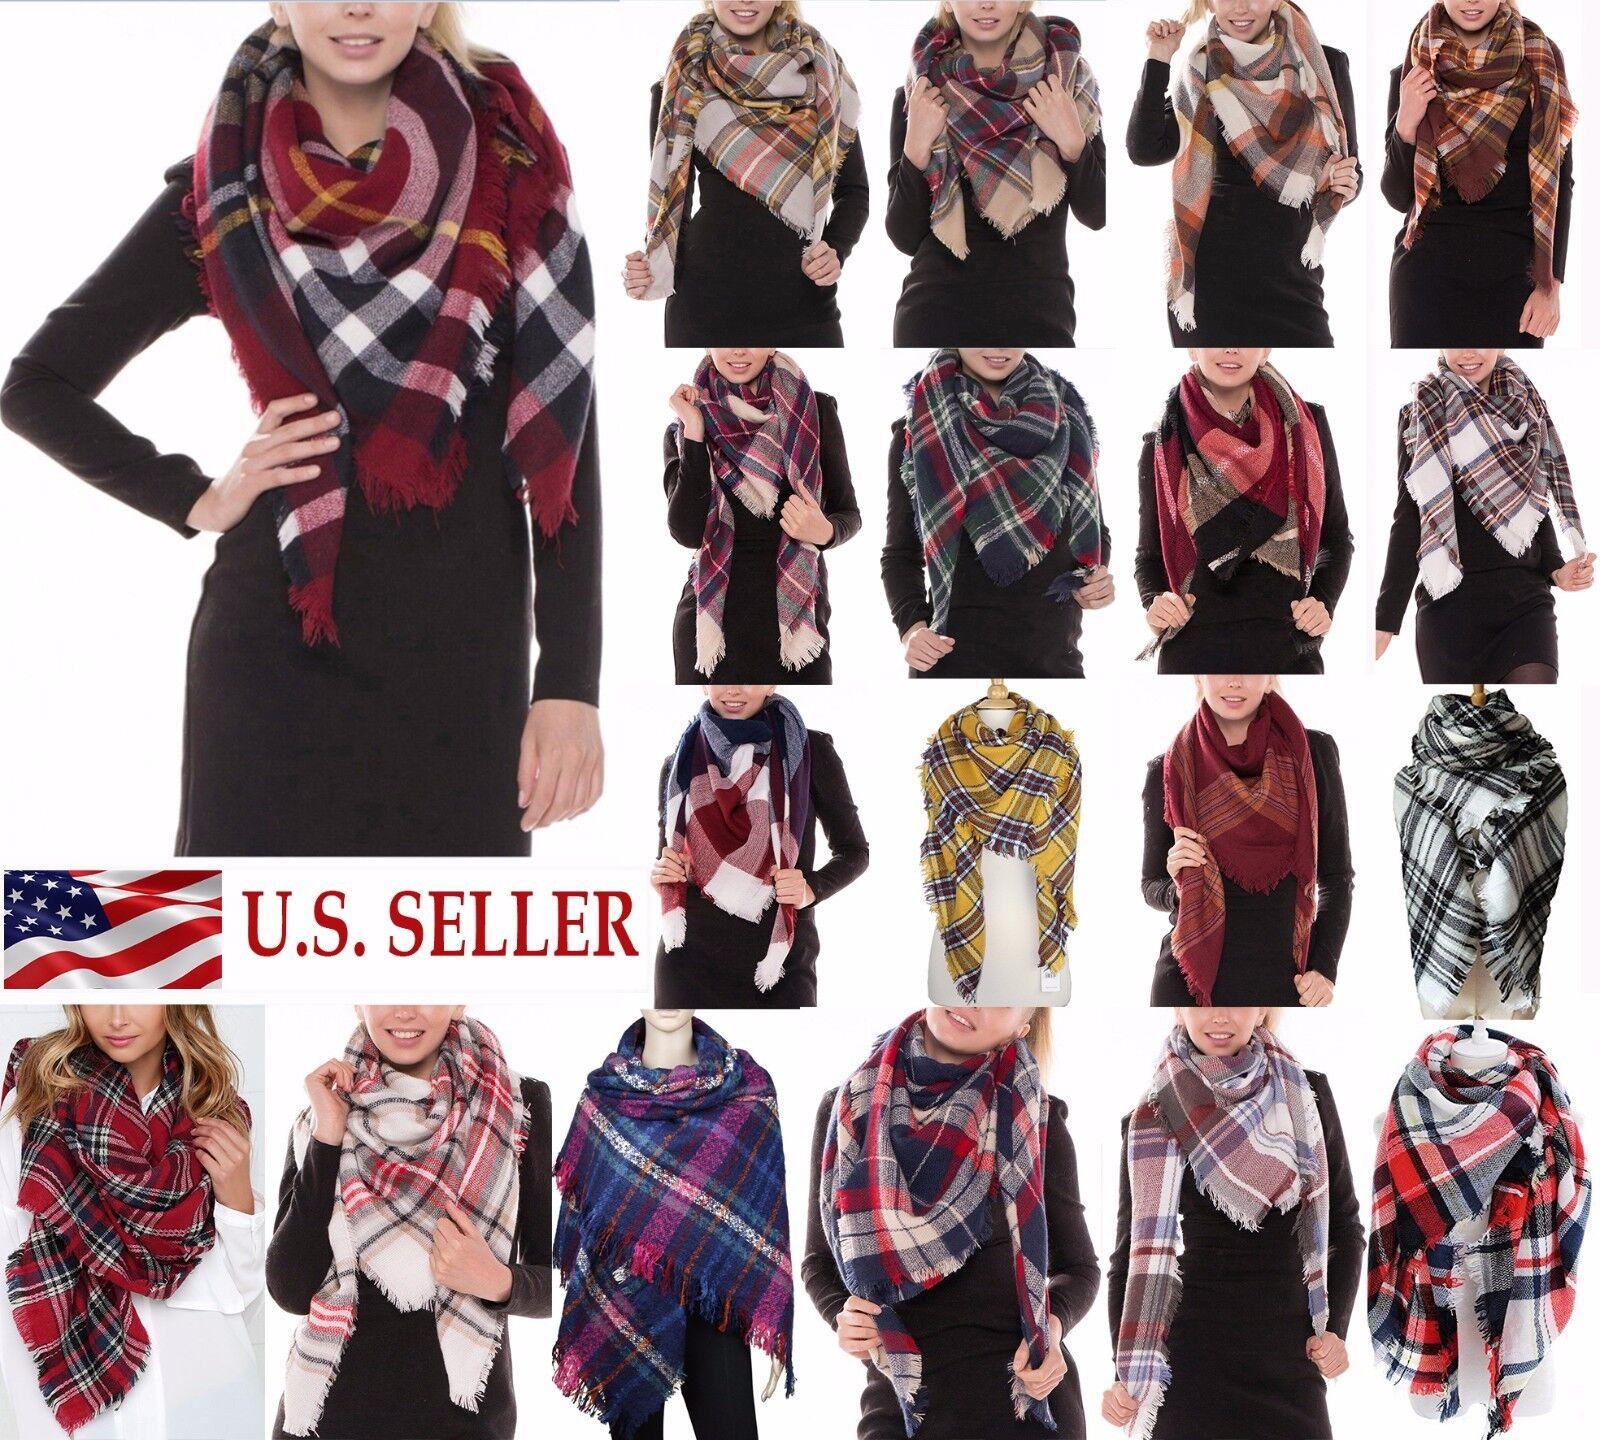 Scarf - Womens Oversized Tartan Plaid Blanket Scarf Large Checked Wrap Shawl Winter Warm